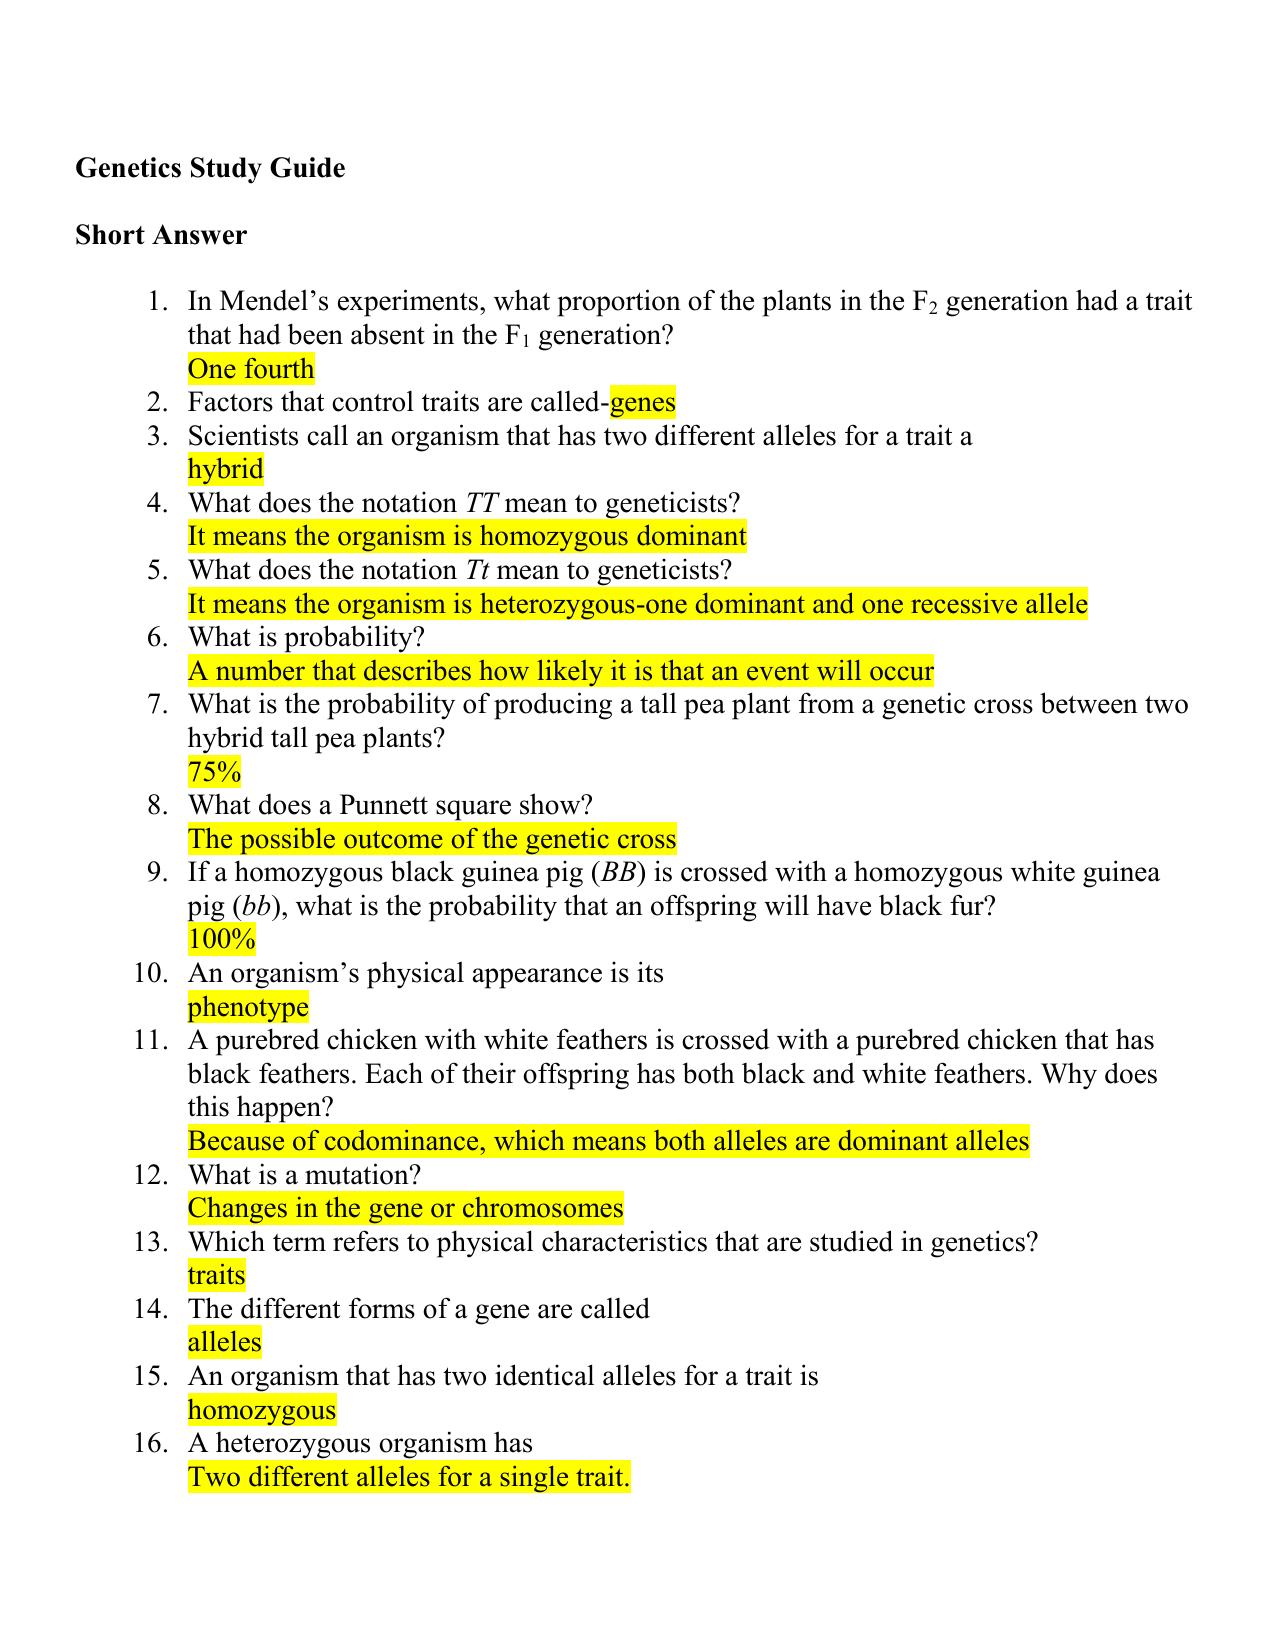 Genetics Study Guide Short Answer